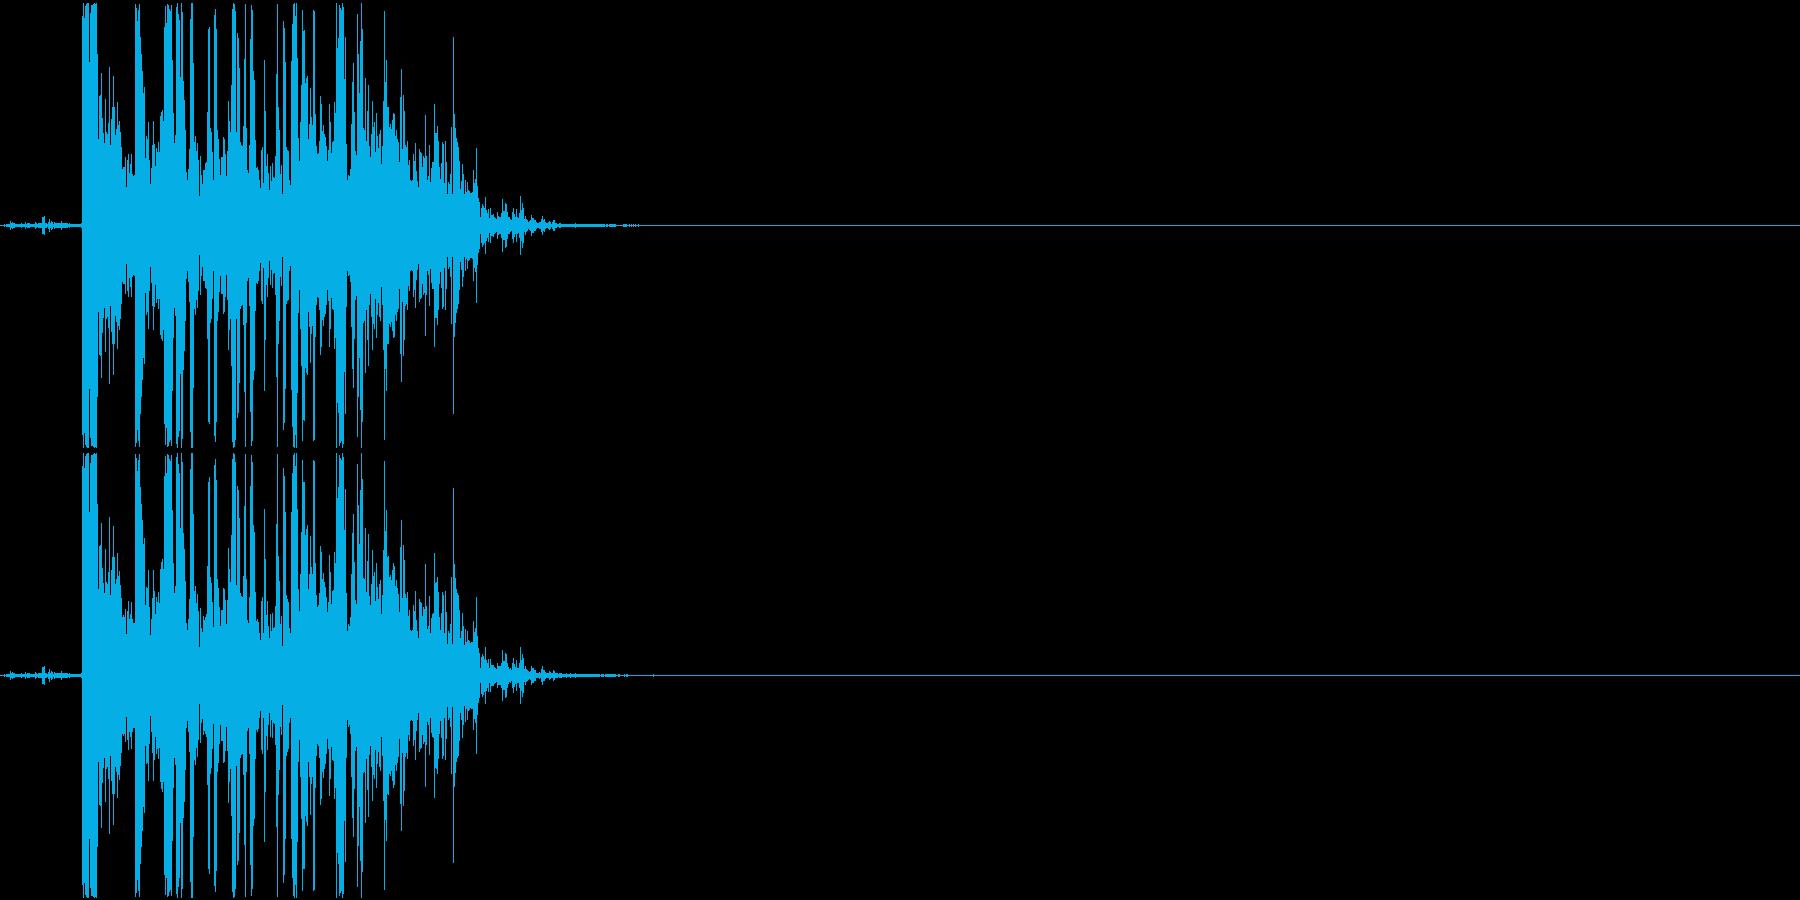 Coin チップをボウルに入れる音 小銭の再生済みの波形